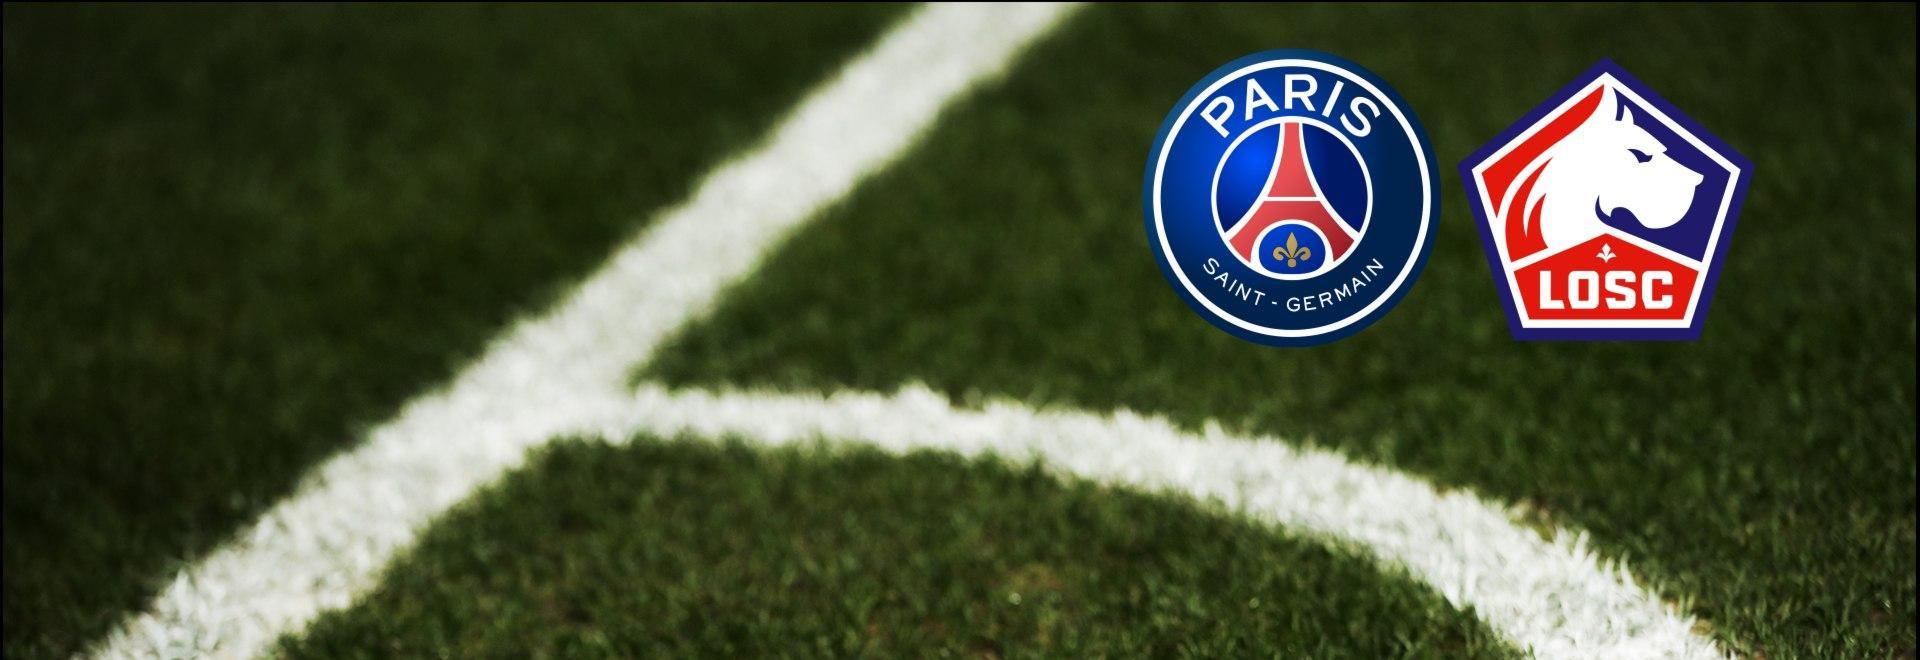 PSG - Lille. 31a g.